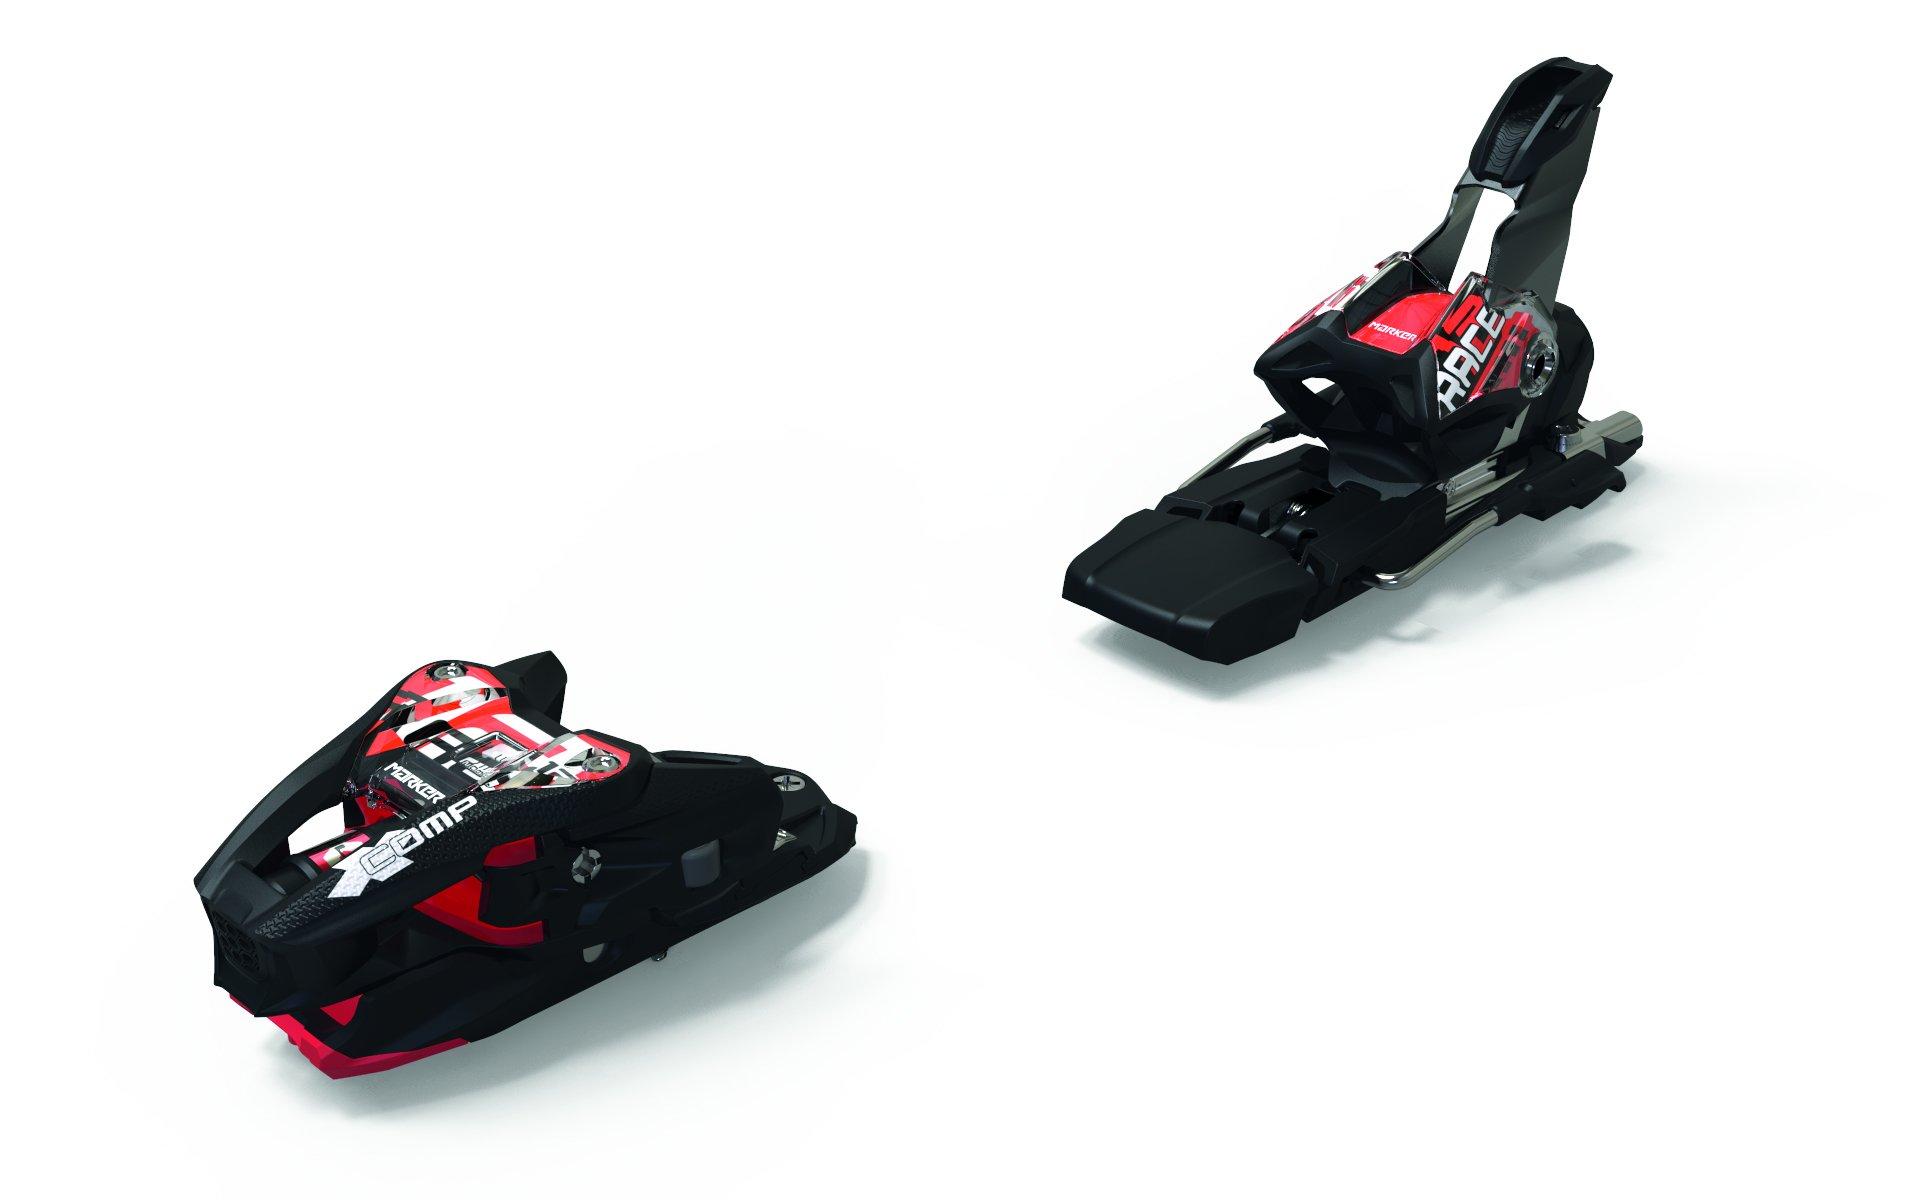 2021 Marker XComp 12 Ski Binding